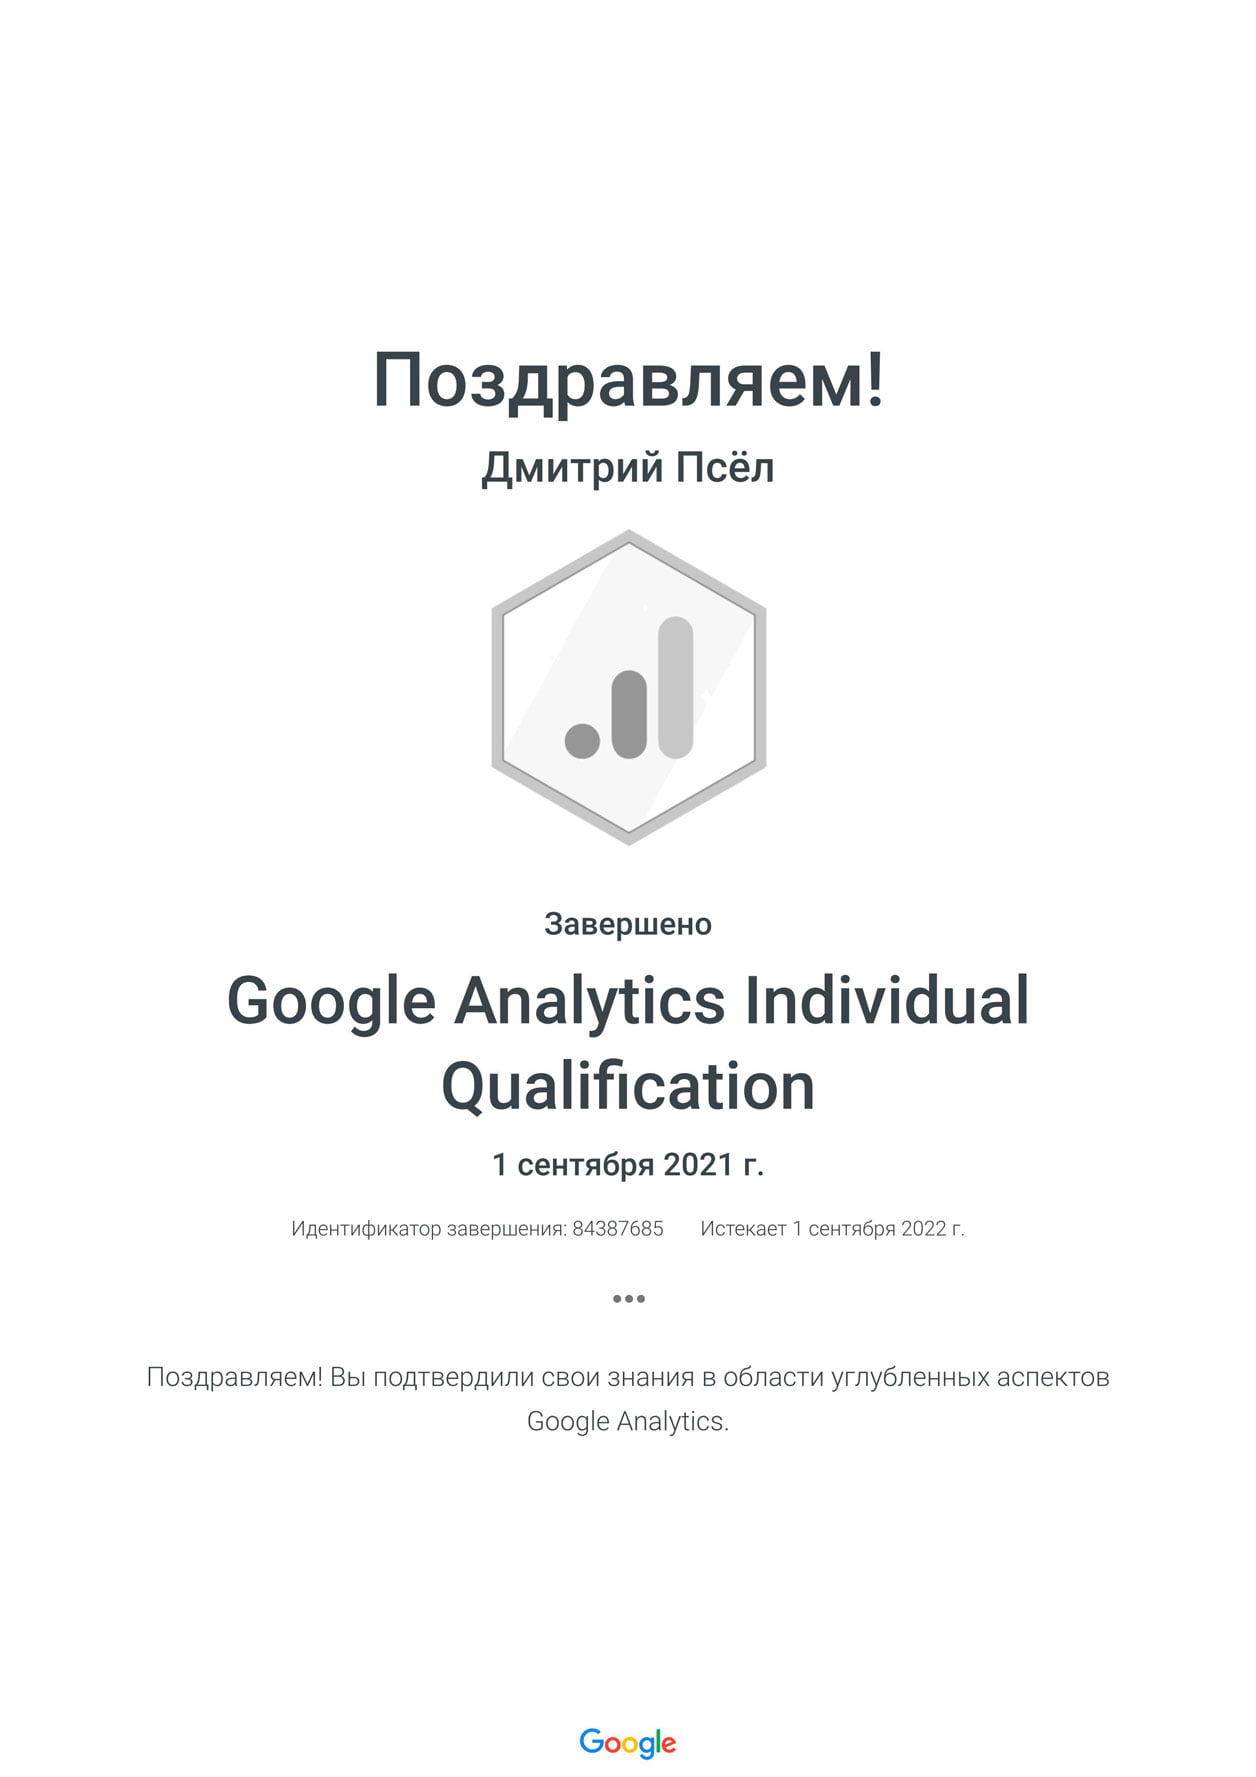 Дмитро Псьол - Сертифікат Google Analytics Individual Qualification